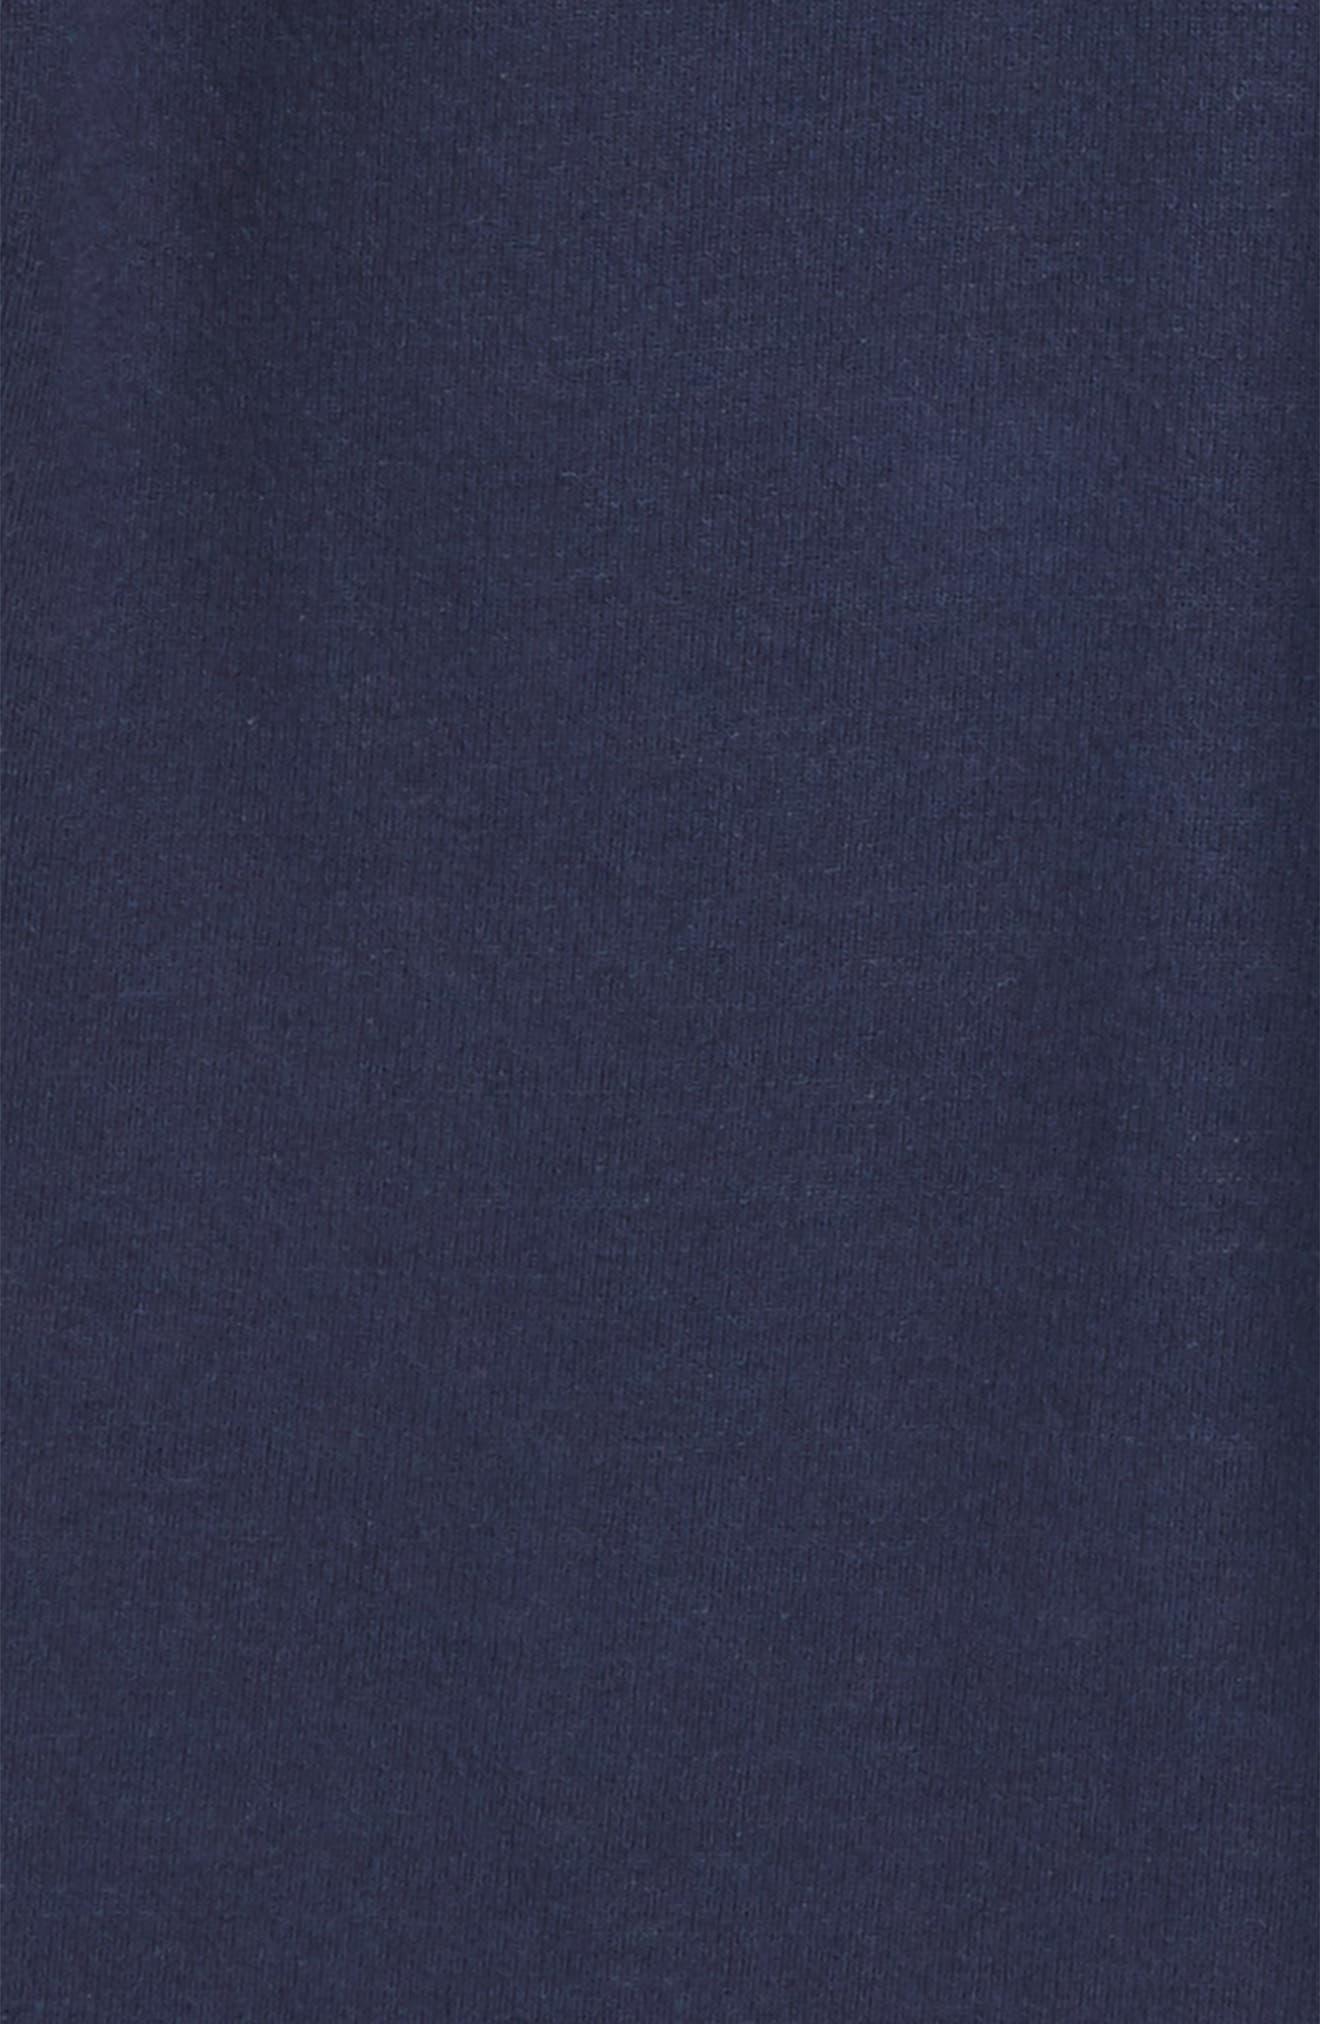 Paneled Shorts,                             Alternate thumbnail 2, color,                             420